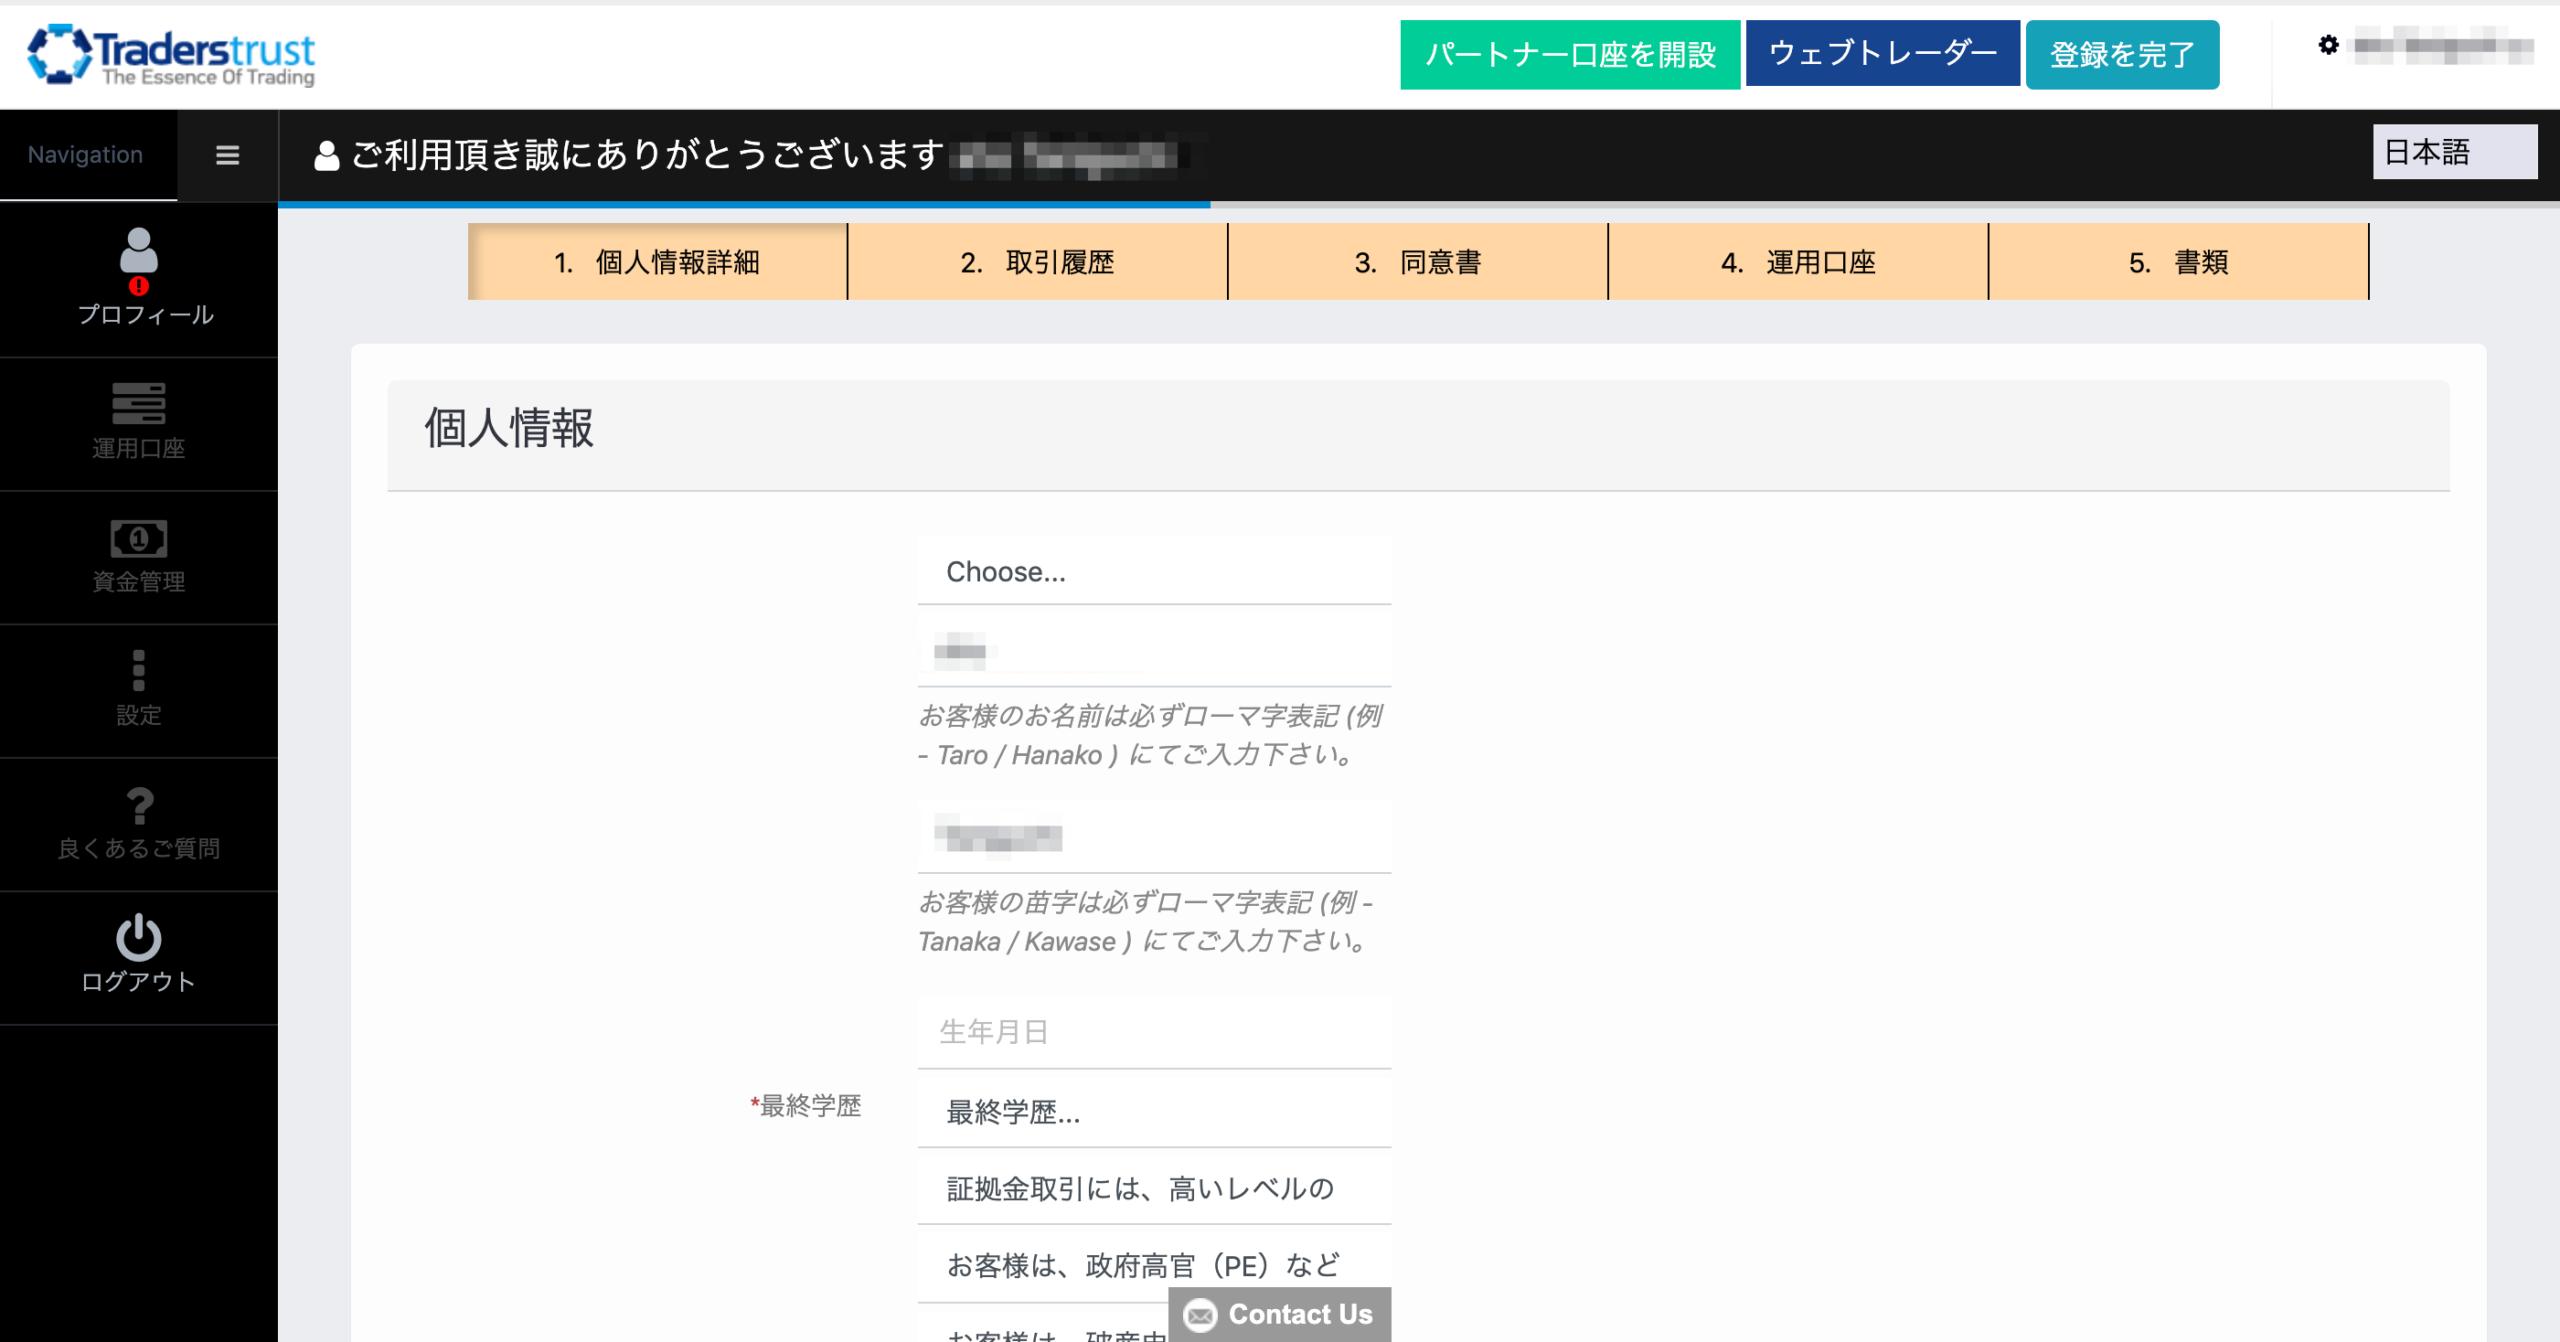 TreadersTrust個人情報詳細を入力